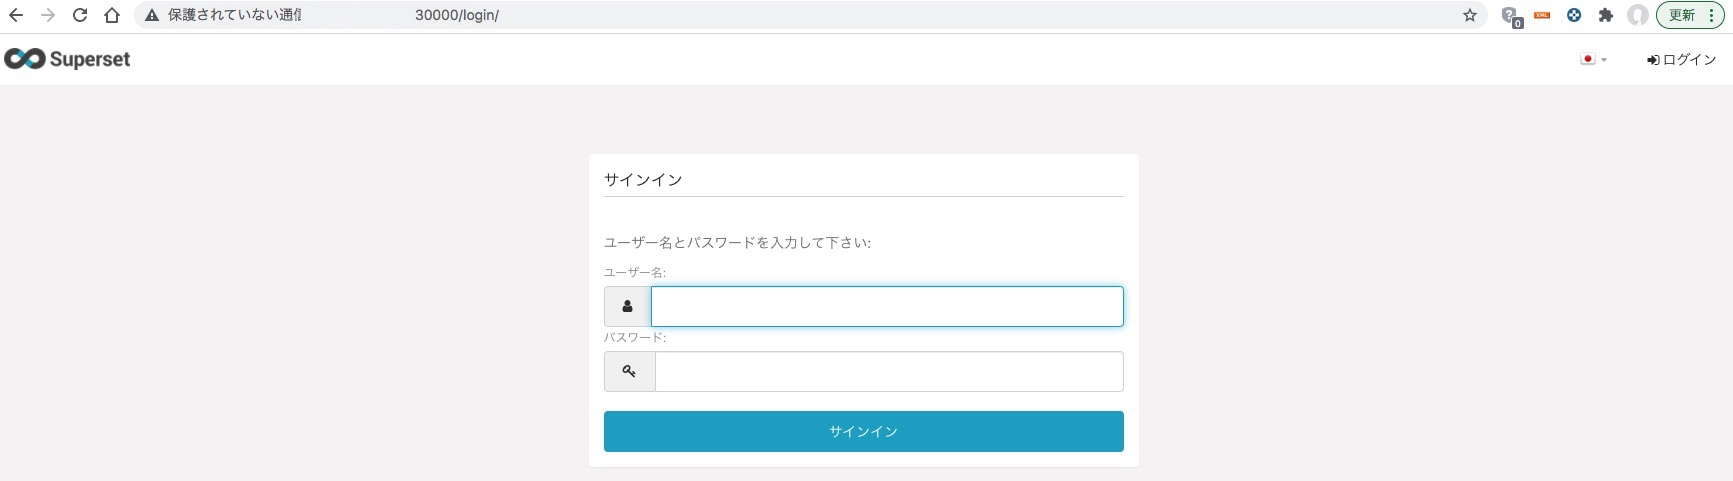 supersetログイン画面(日本語)